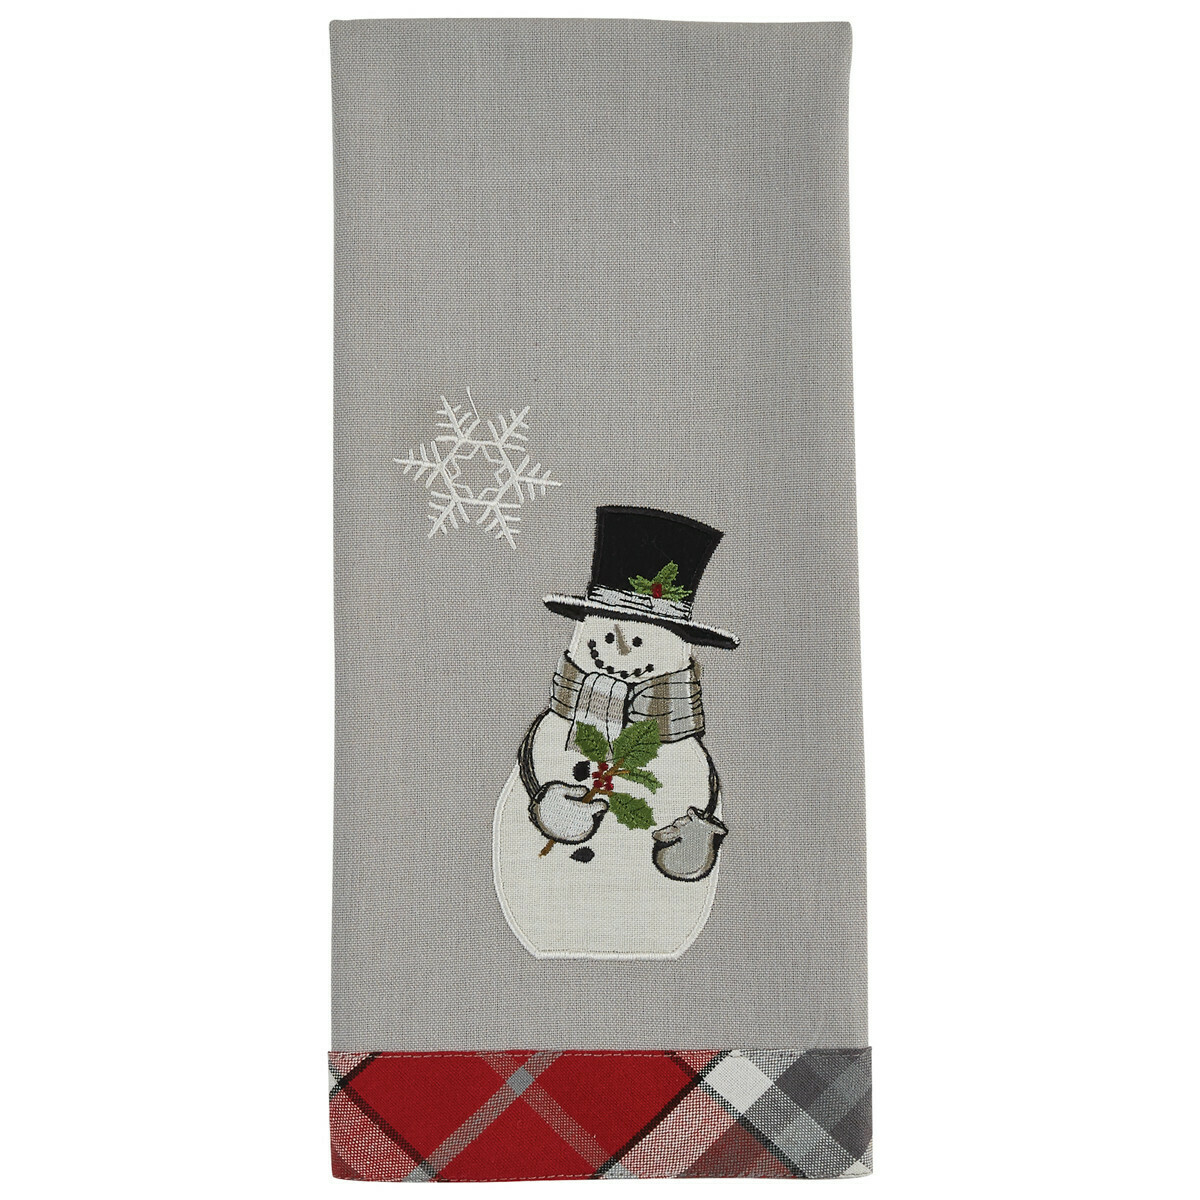 Snowman and Holly Decorative Dishtowel